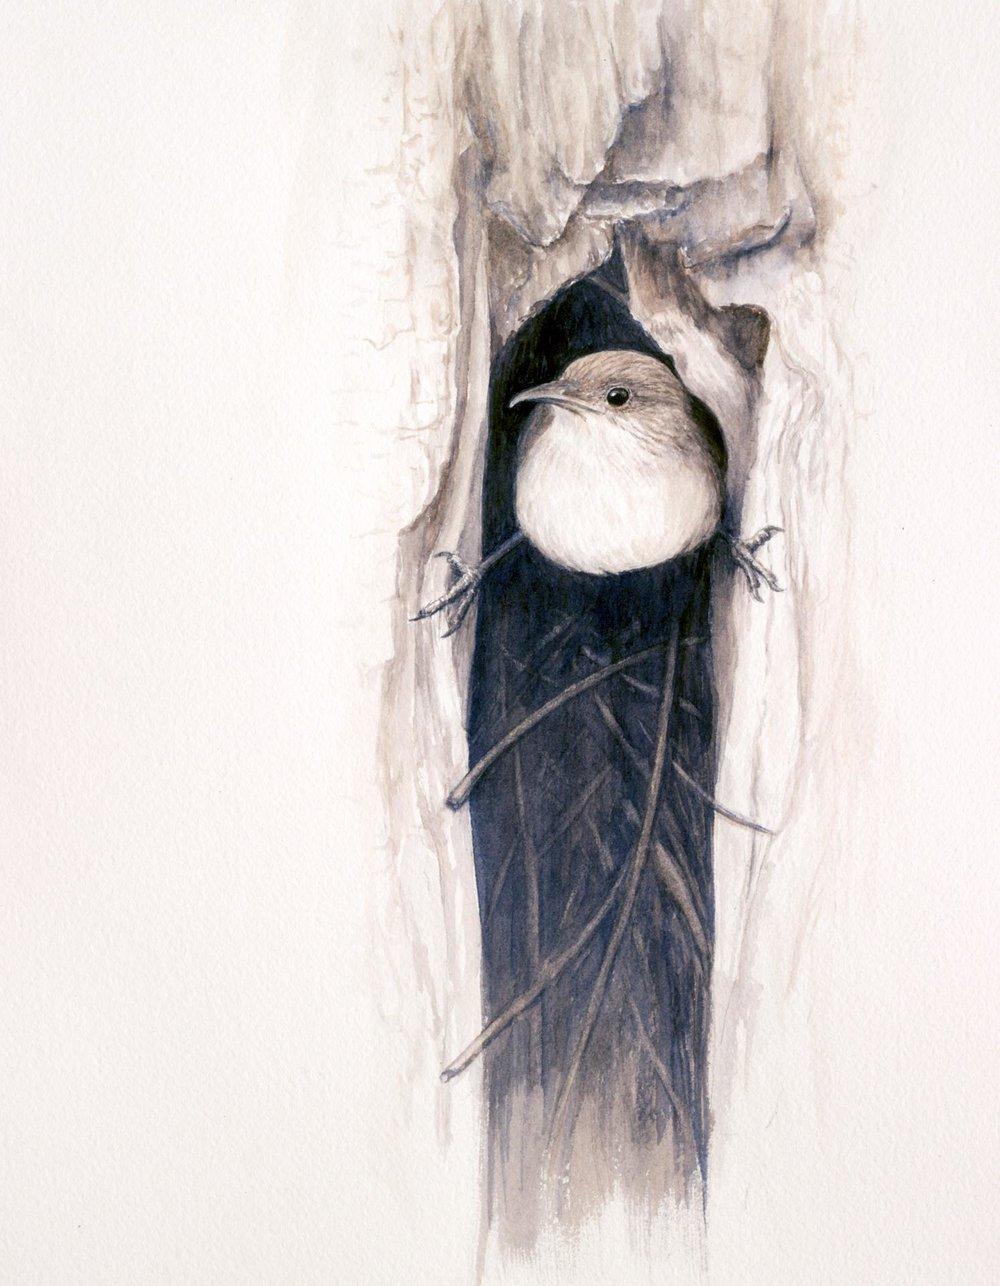 Building A Nest - House Wren, Kathy Kleinsteiber